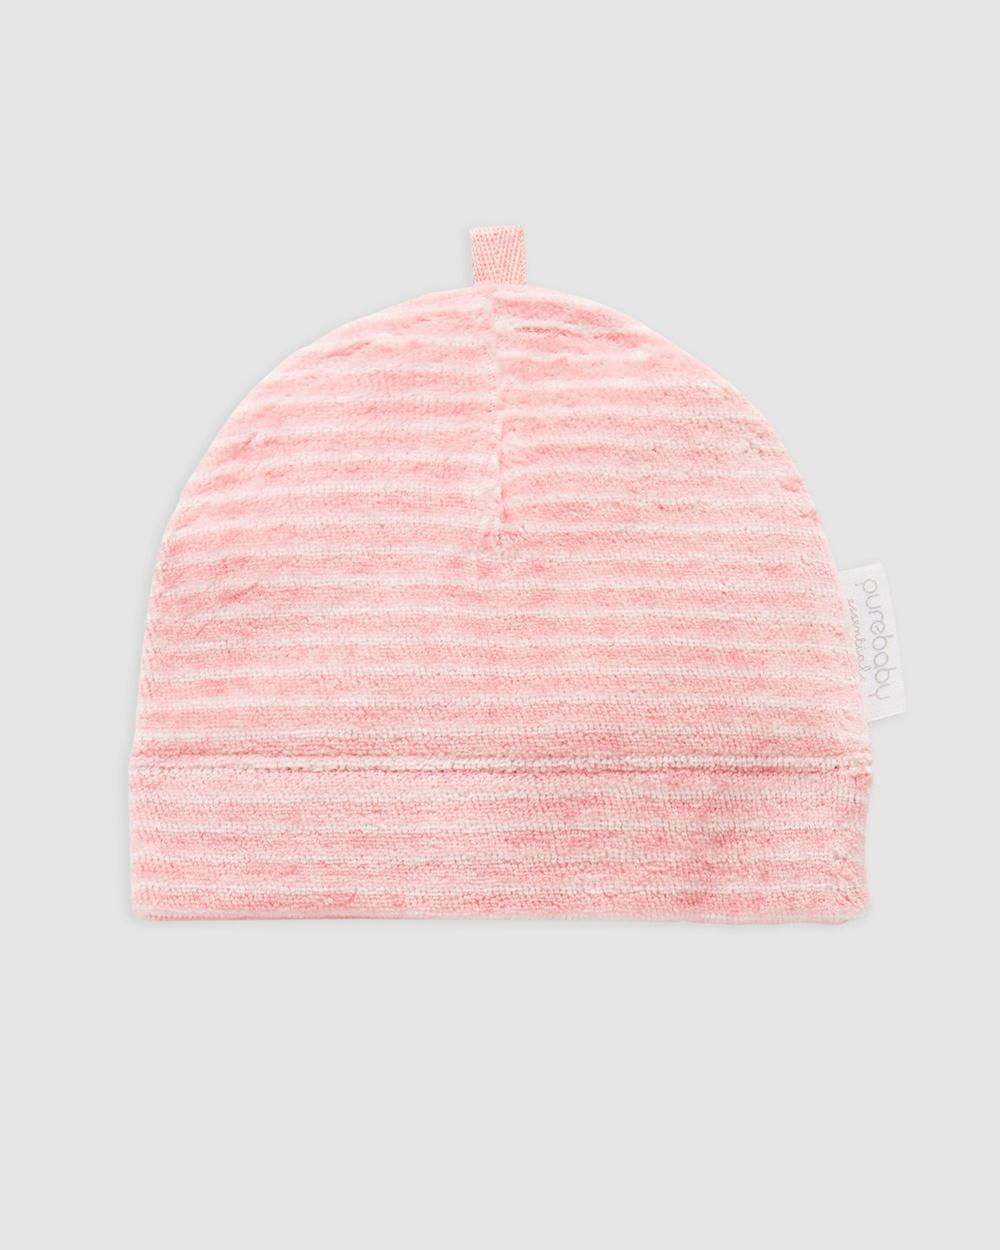 Purebaby Premie Hat Babies Headwear Bud Pink Stripe